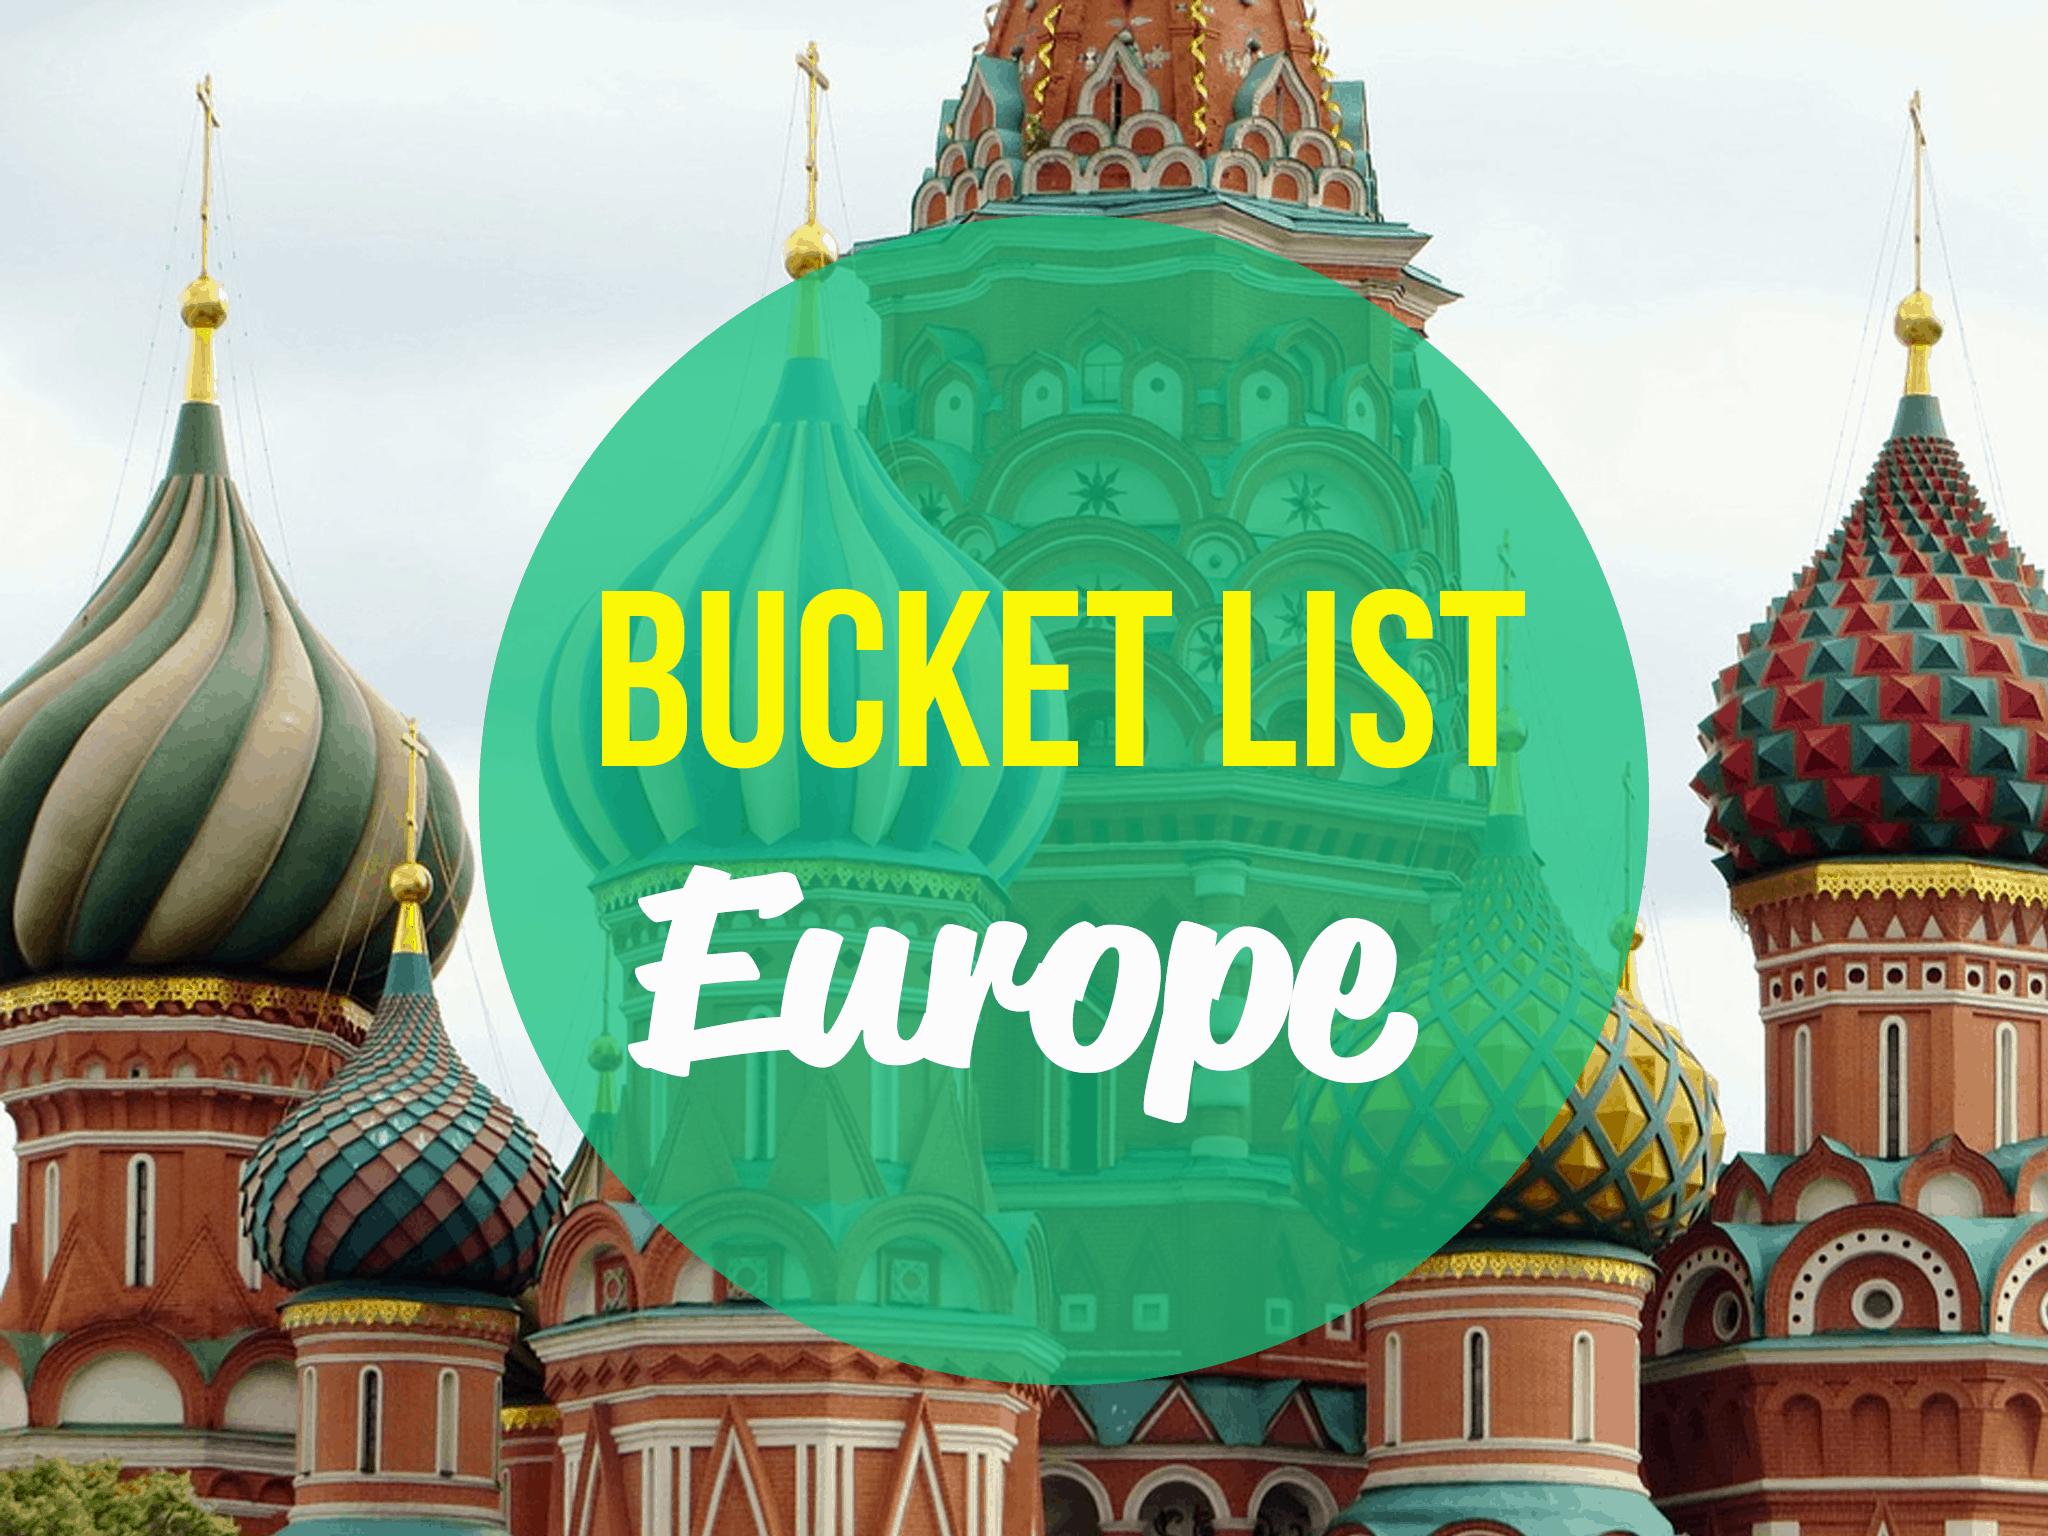 Ultimate Bucket list destinations in Europe